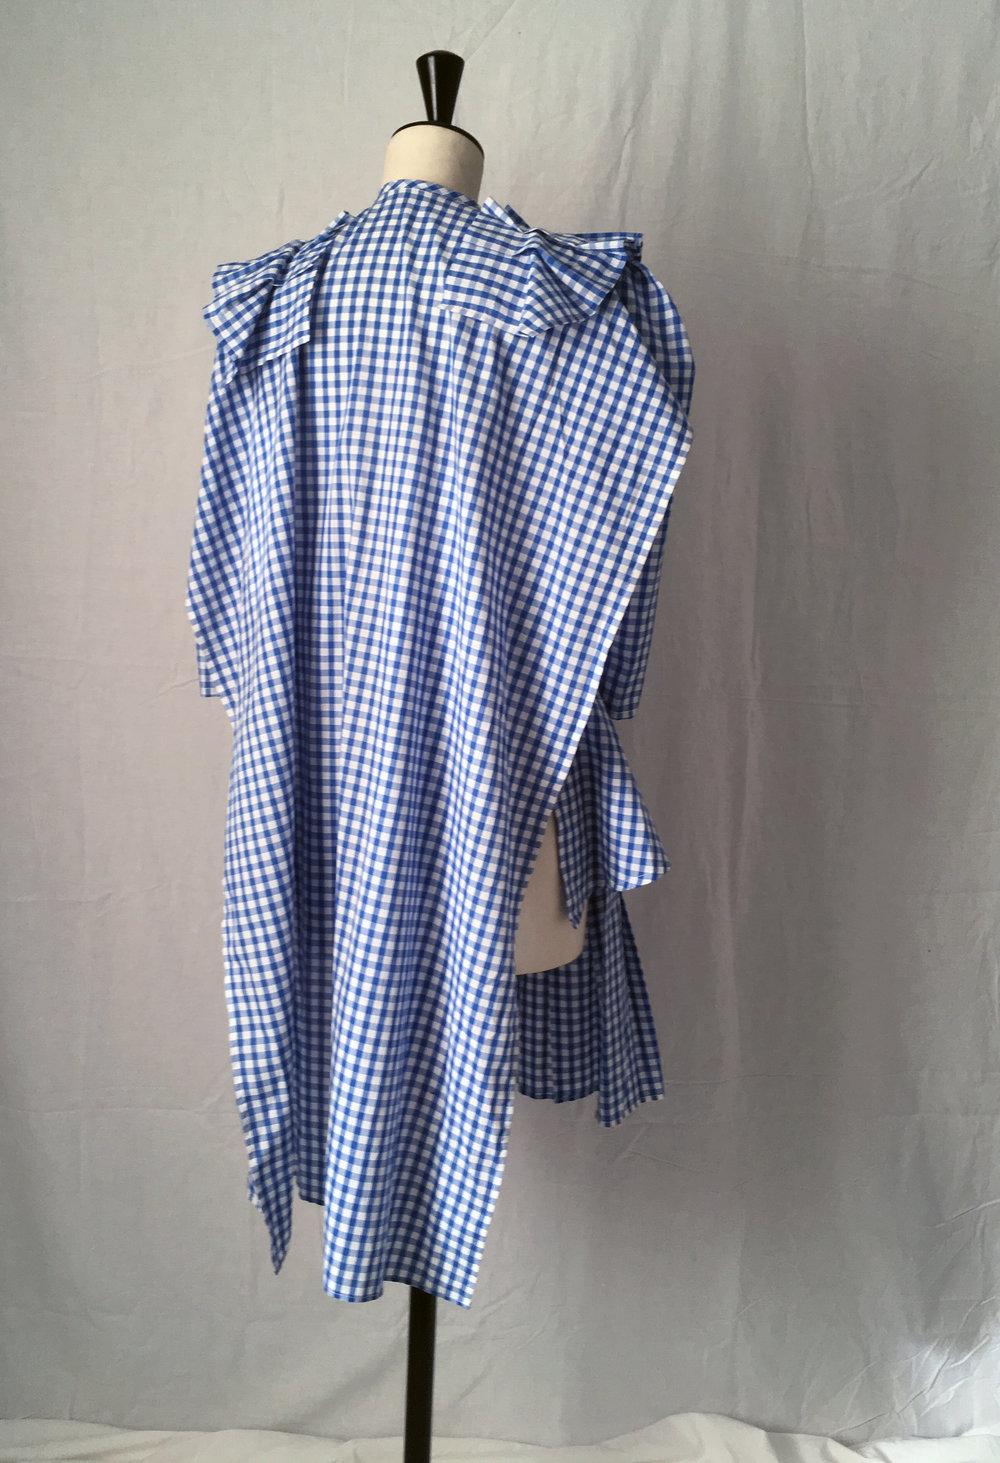 DRESS LTD Back view of adaptable flat pack HALF APRON DOROTHY deconstructed prairie dress #dressltd